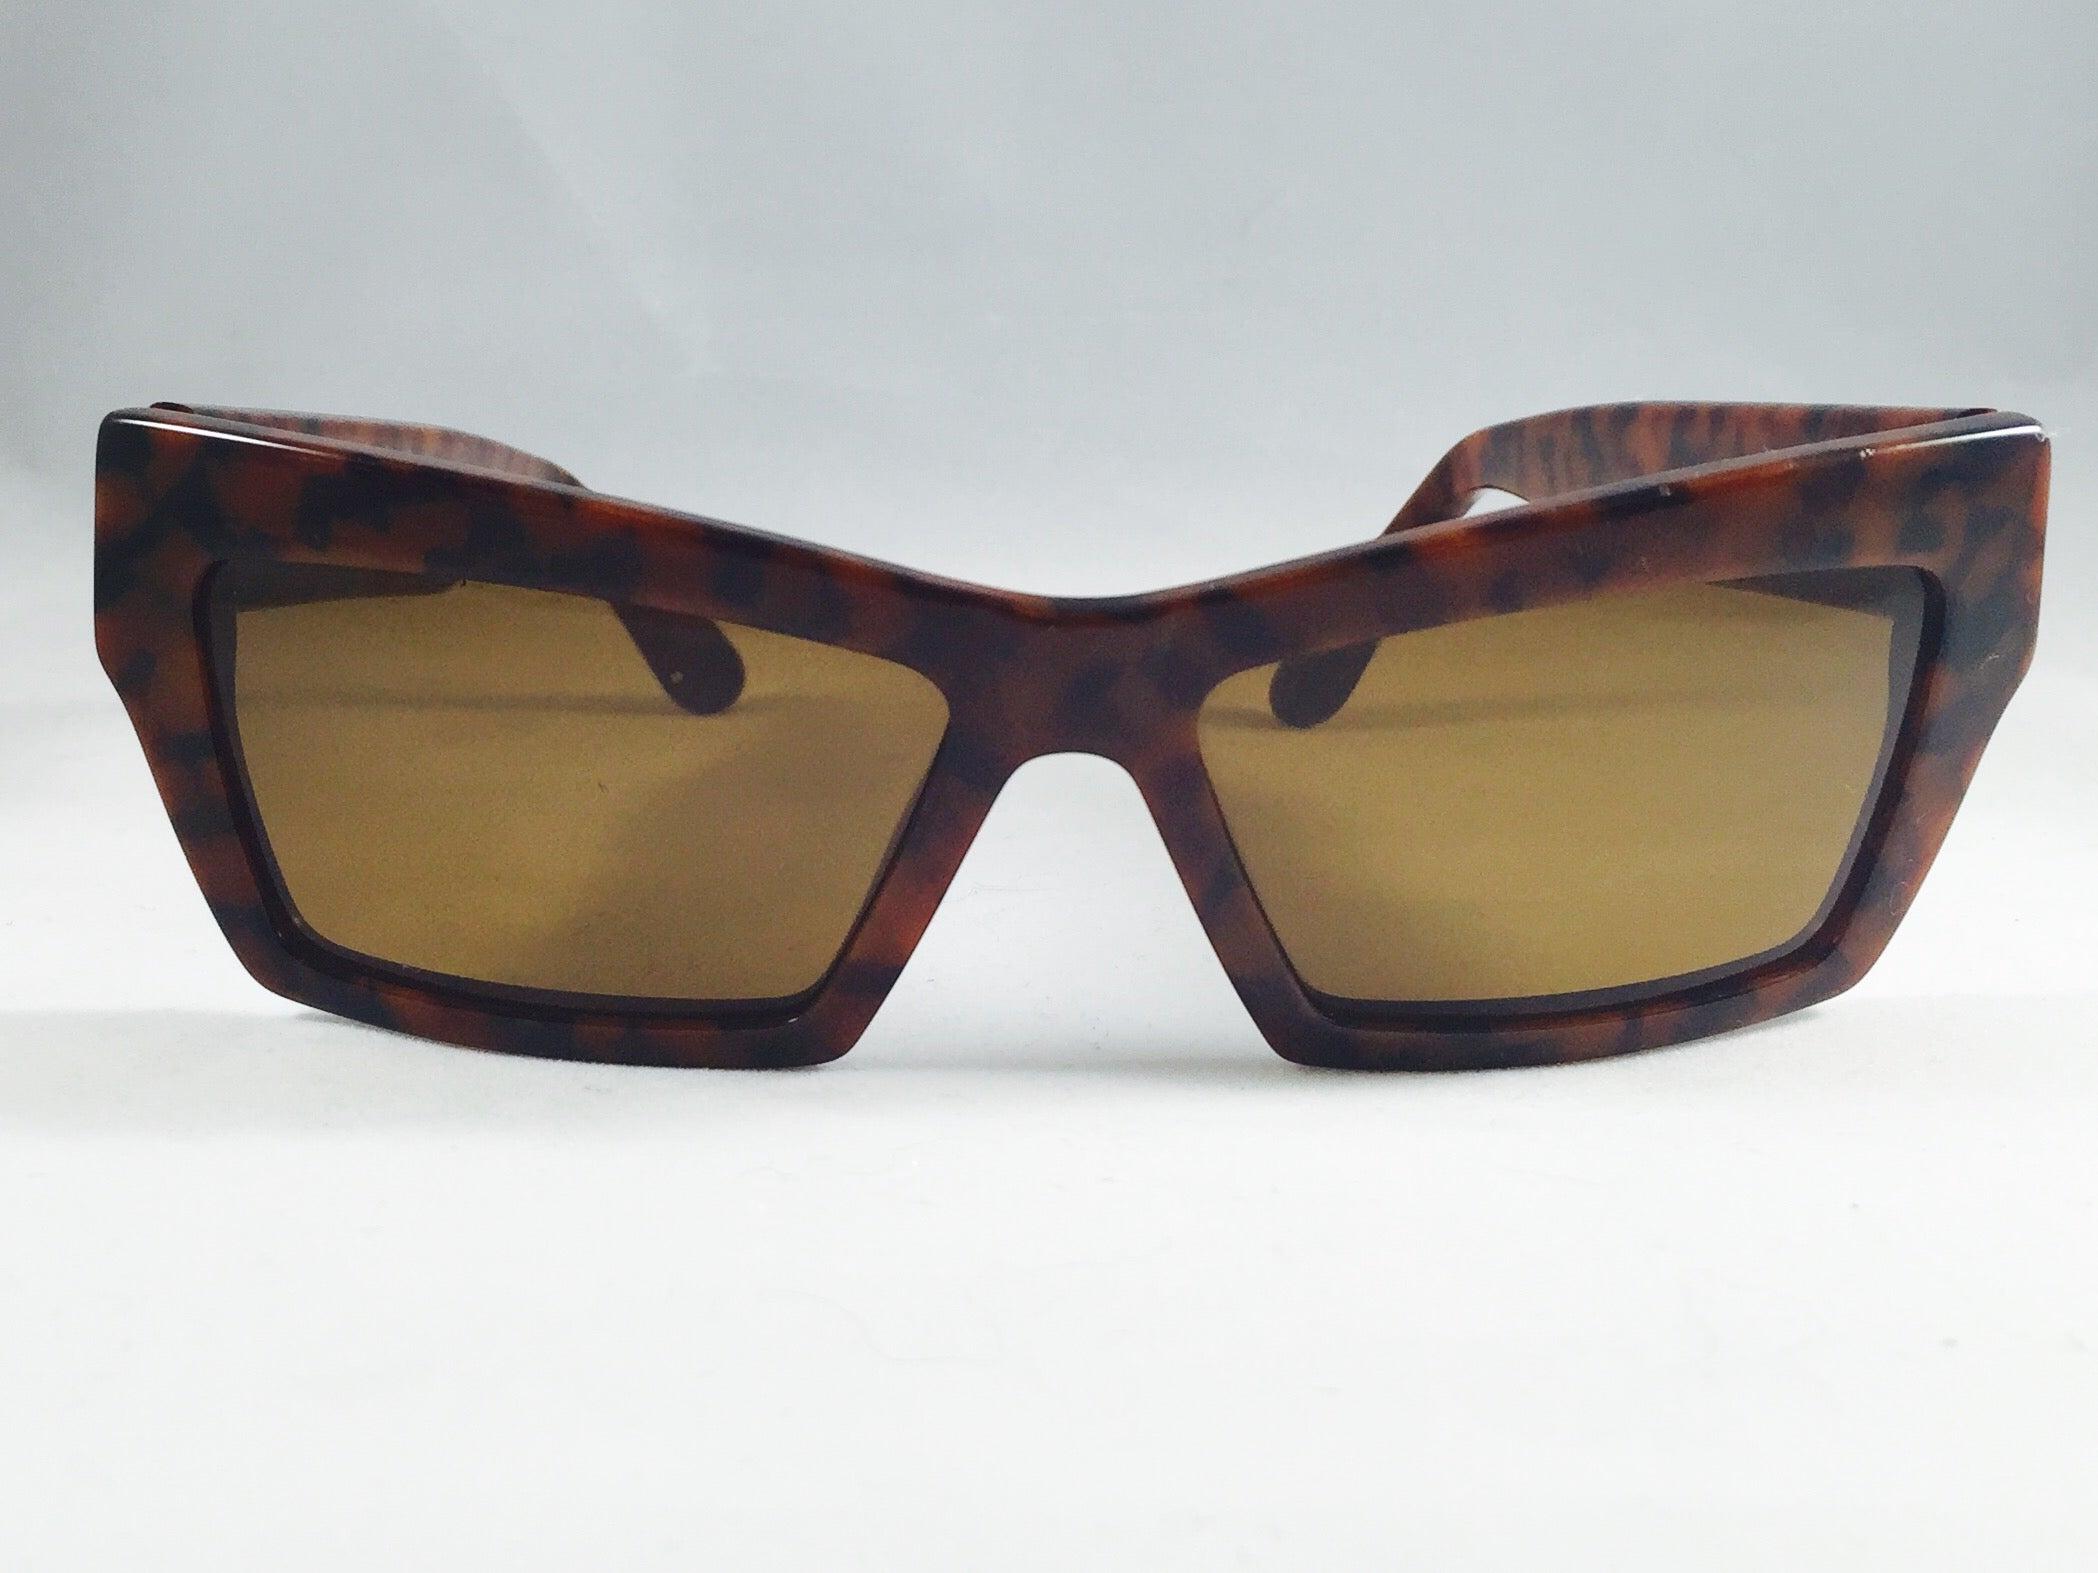 45ffe2bf4e4e 1990s Gianni Versace Tortoise Wayfarer Sunglasses With Mudusa Head Temples  For Sale at 1stdibs